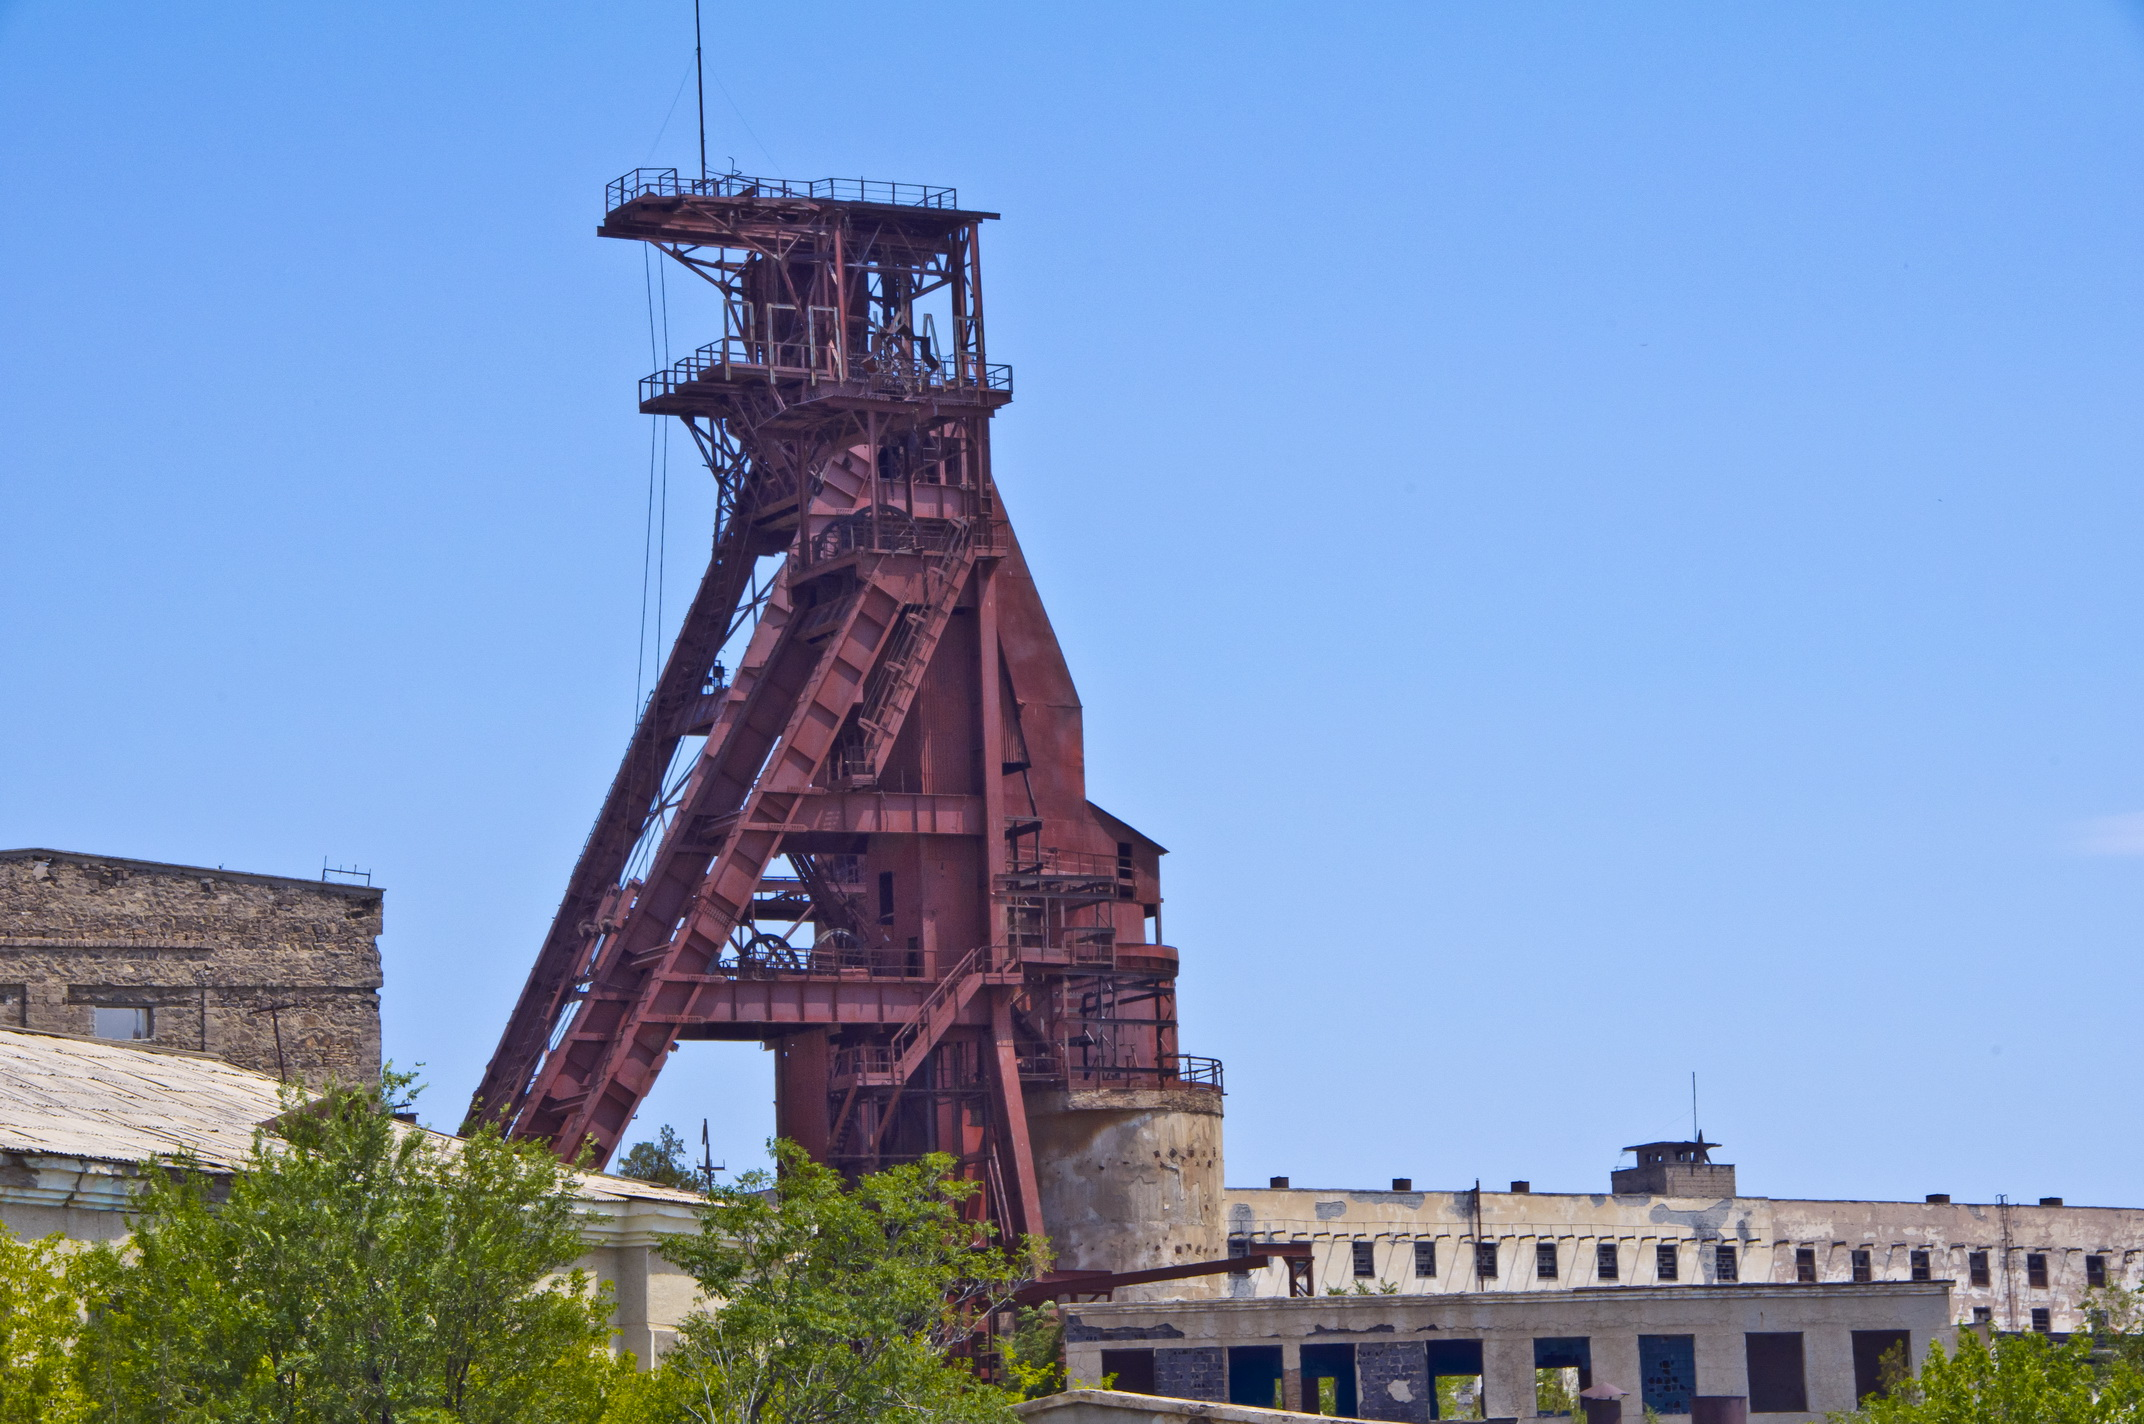 Рудники и производства г.Кентау 0_6ec82_bc7db3b7_orig